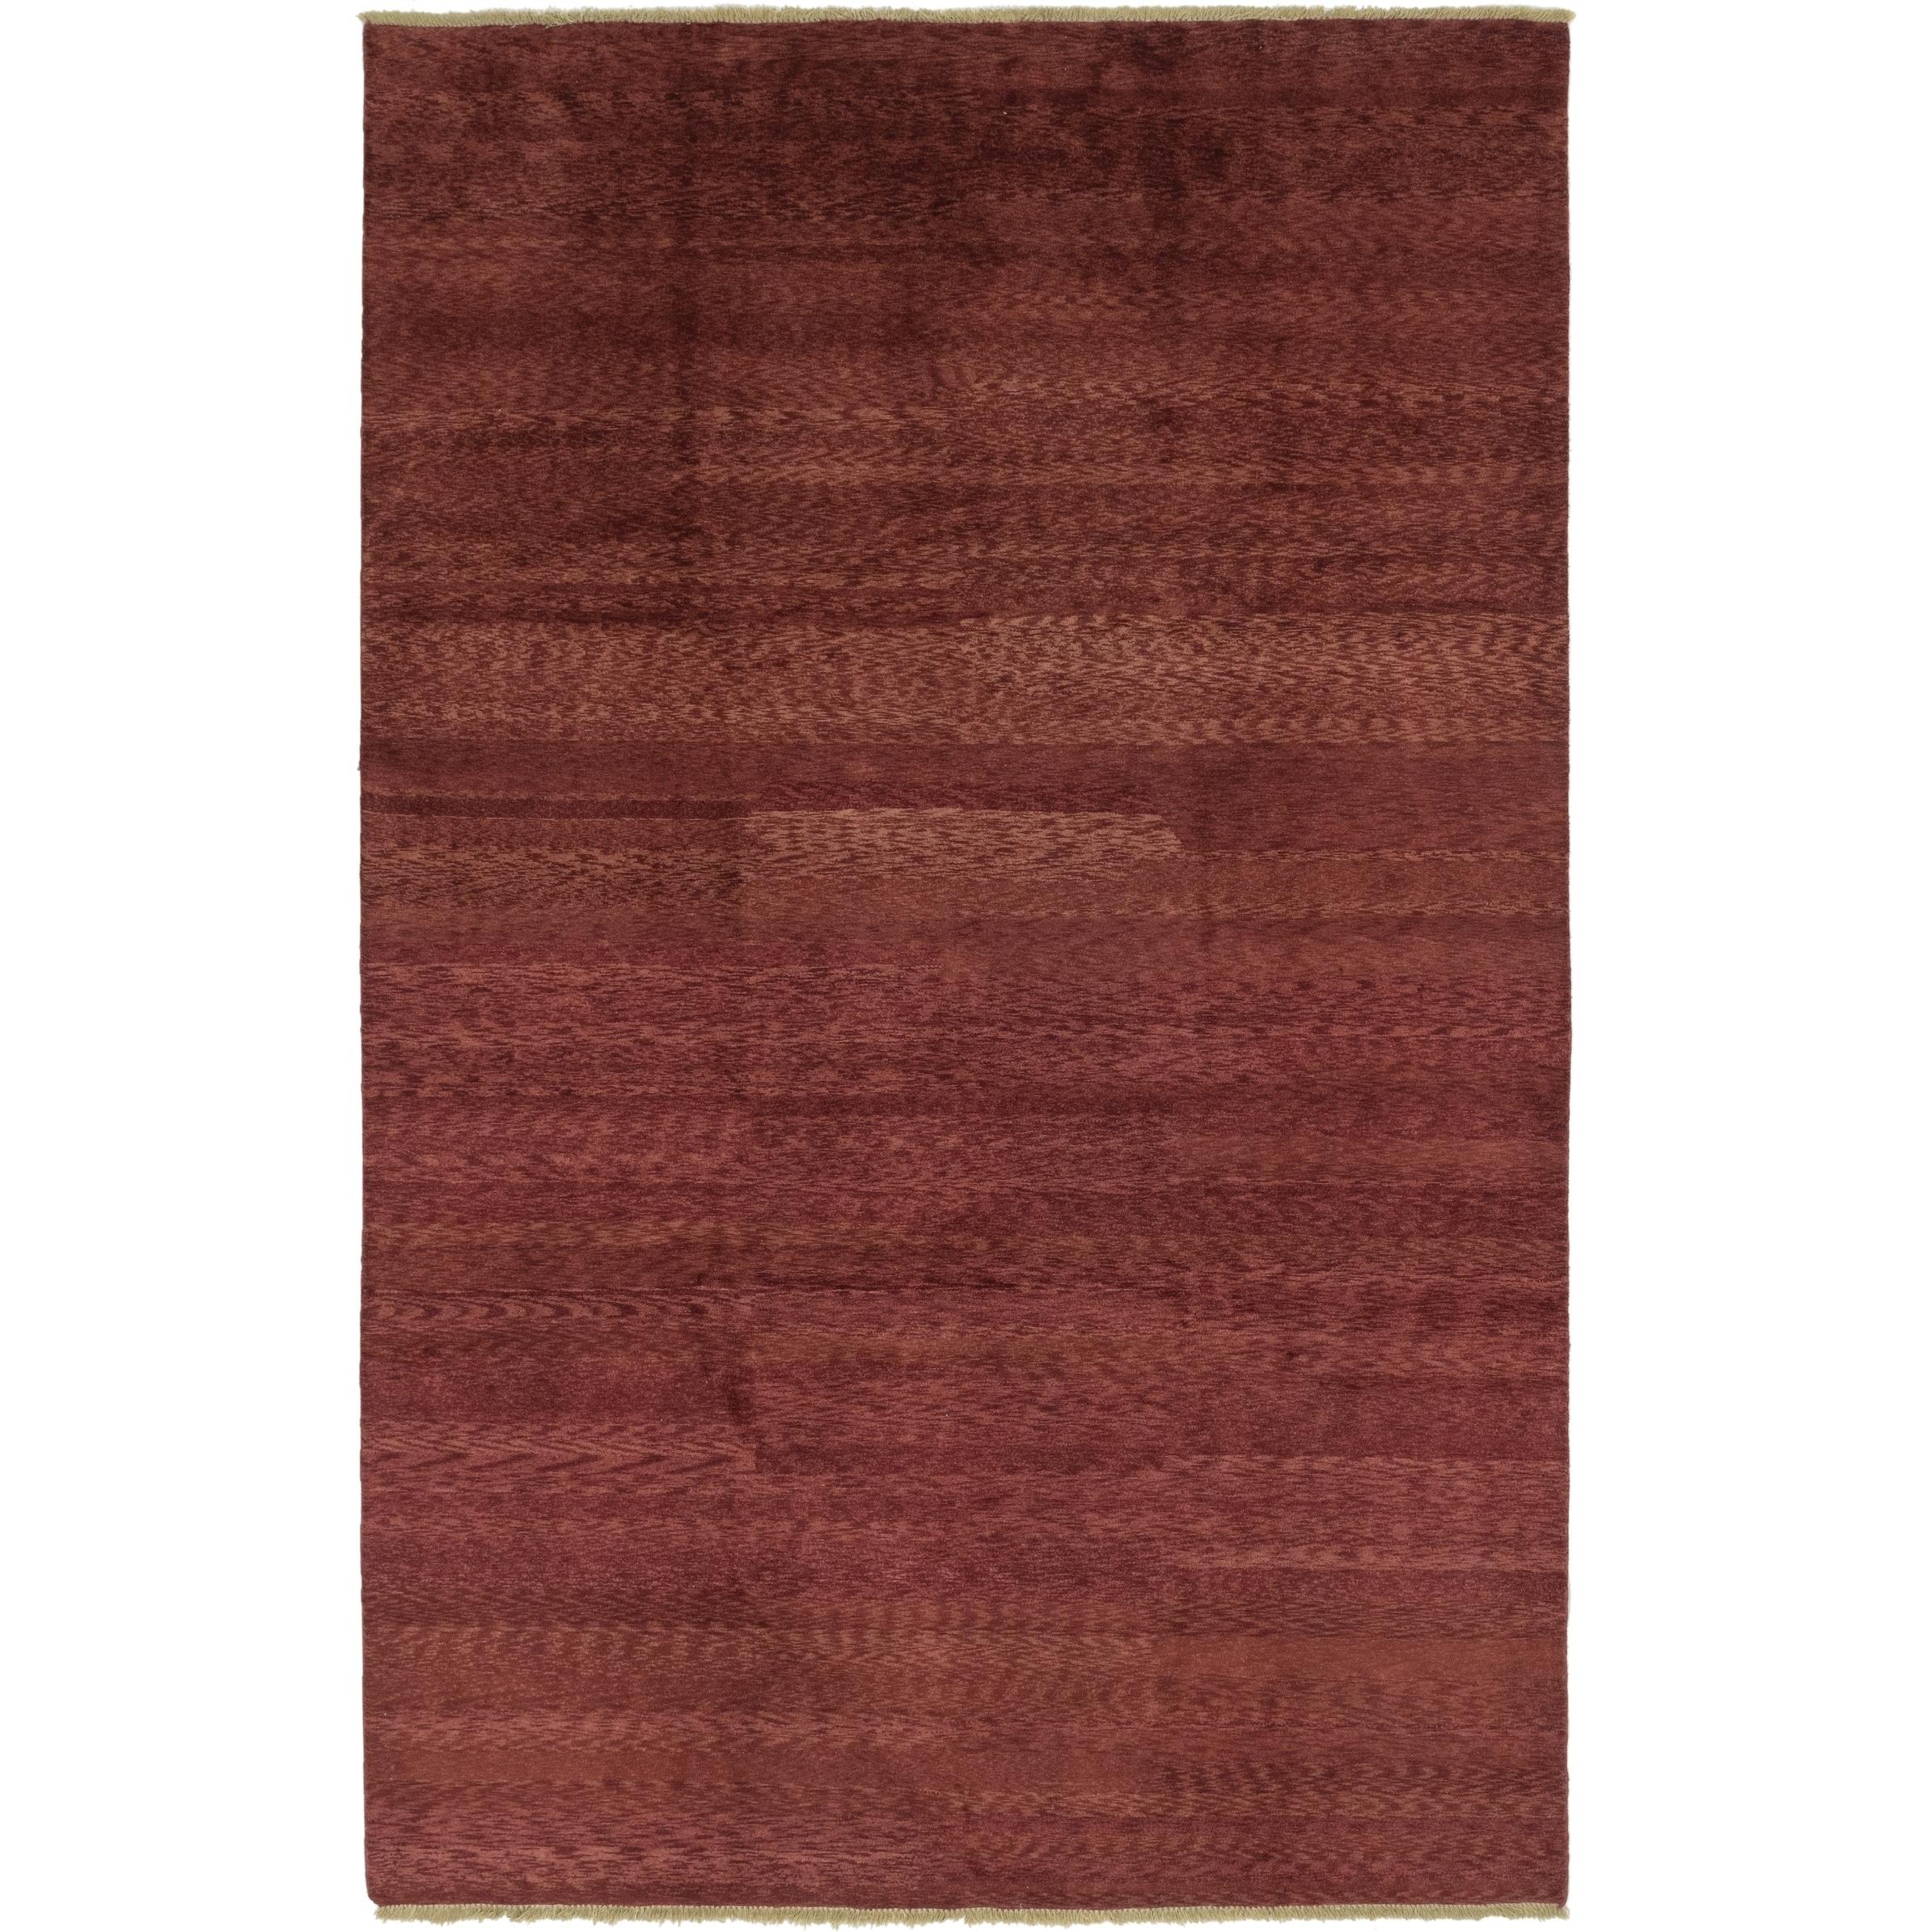 Hand Knotted Kashkuli Gabbeh Wool Area Rug - 7 x 11 (Burgundy - 7 x 11)